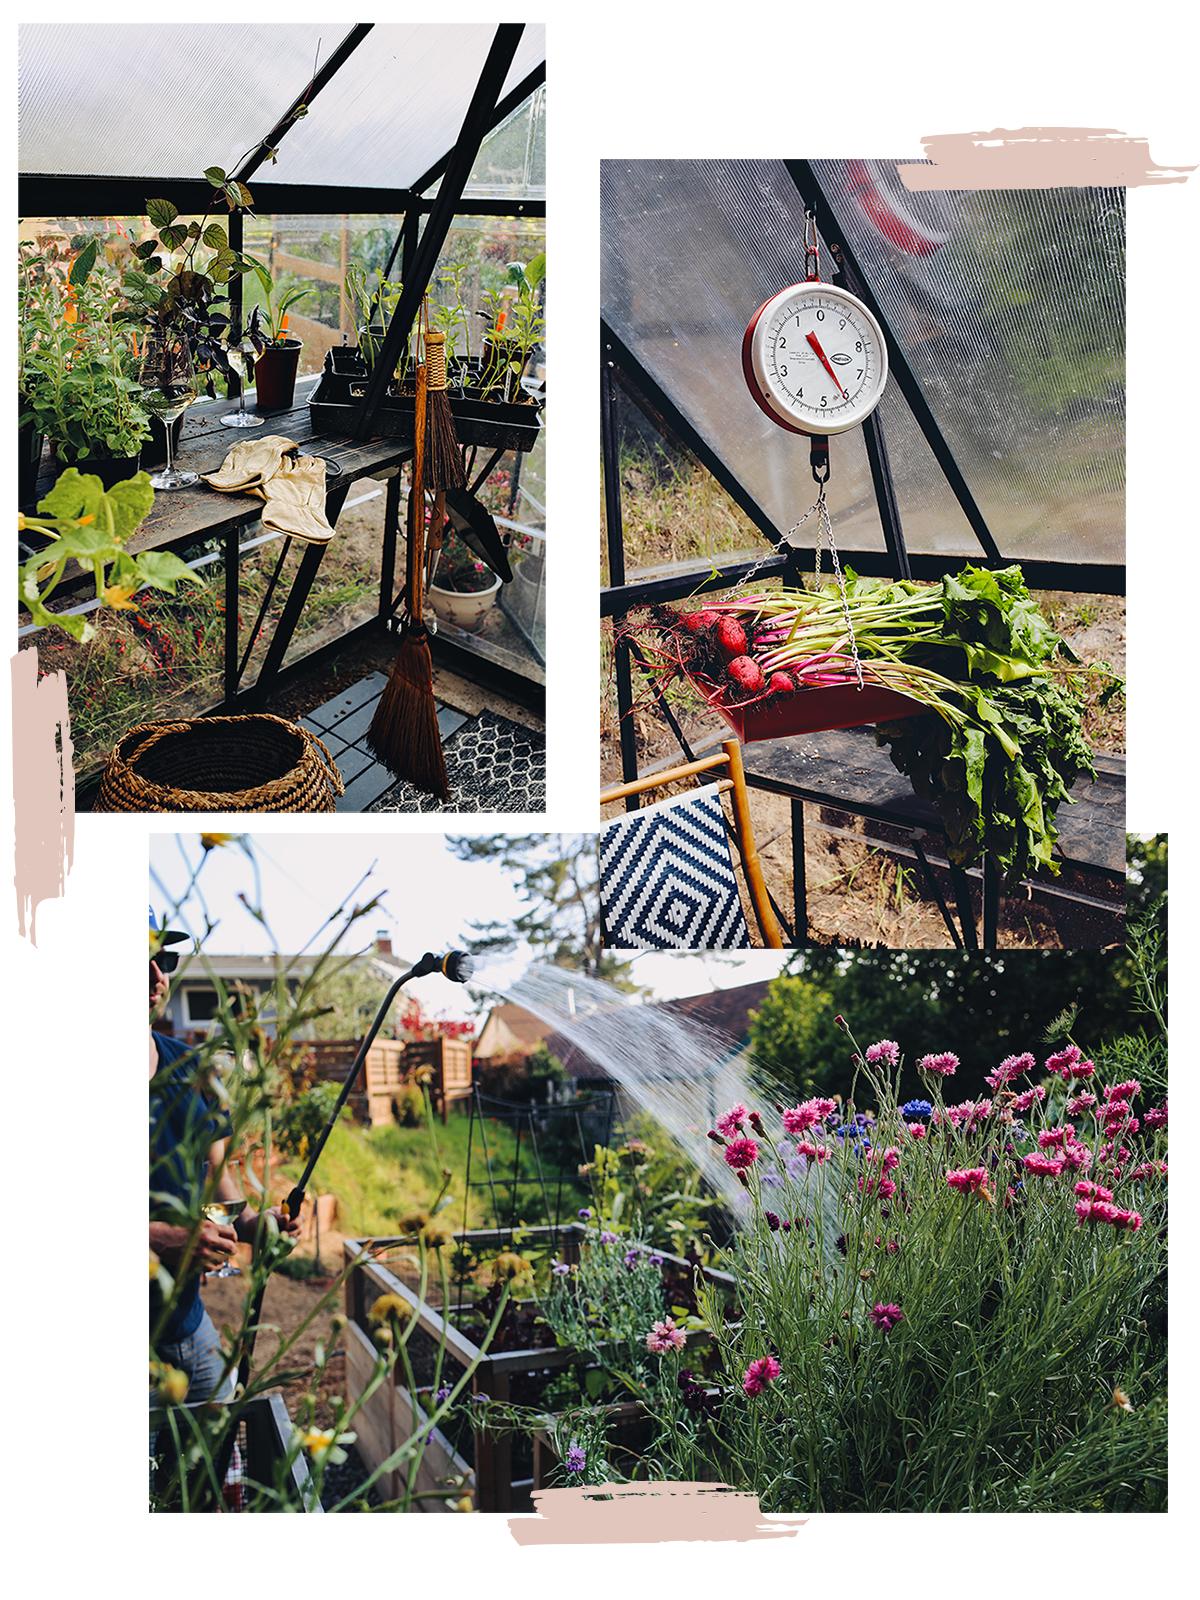 07_Plant Care Watering & Wine | Dine X Design copy.jpg